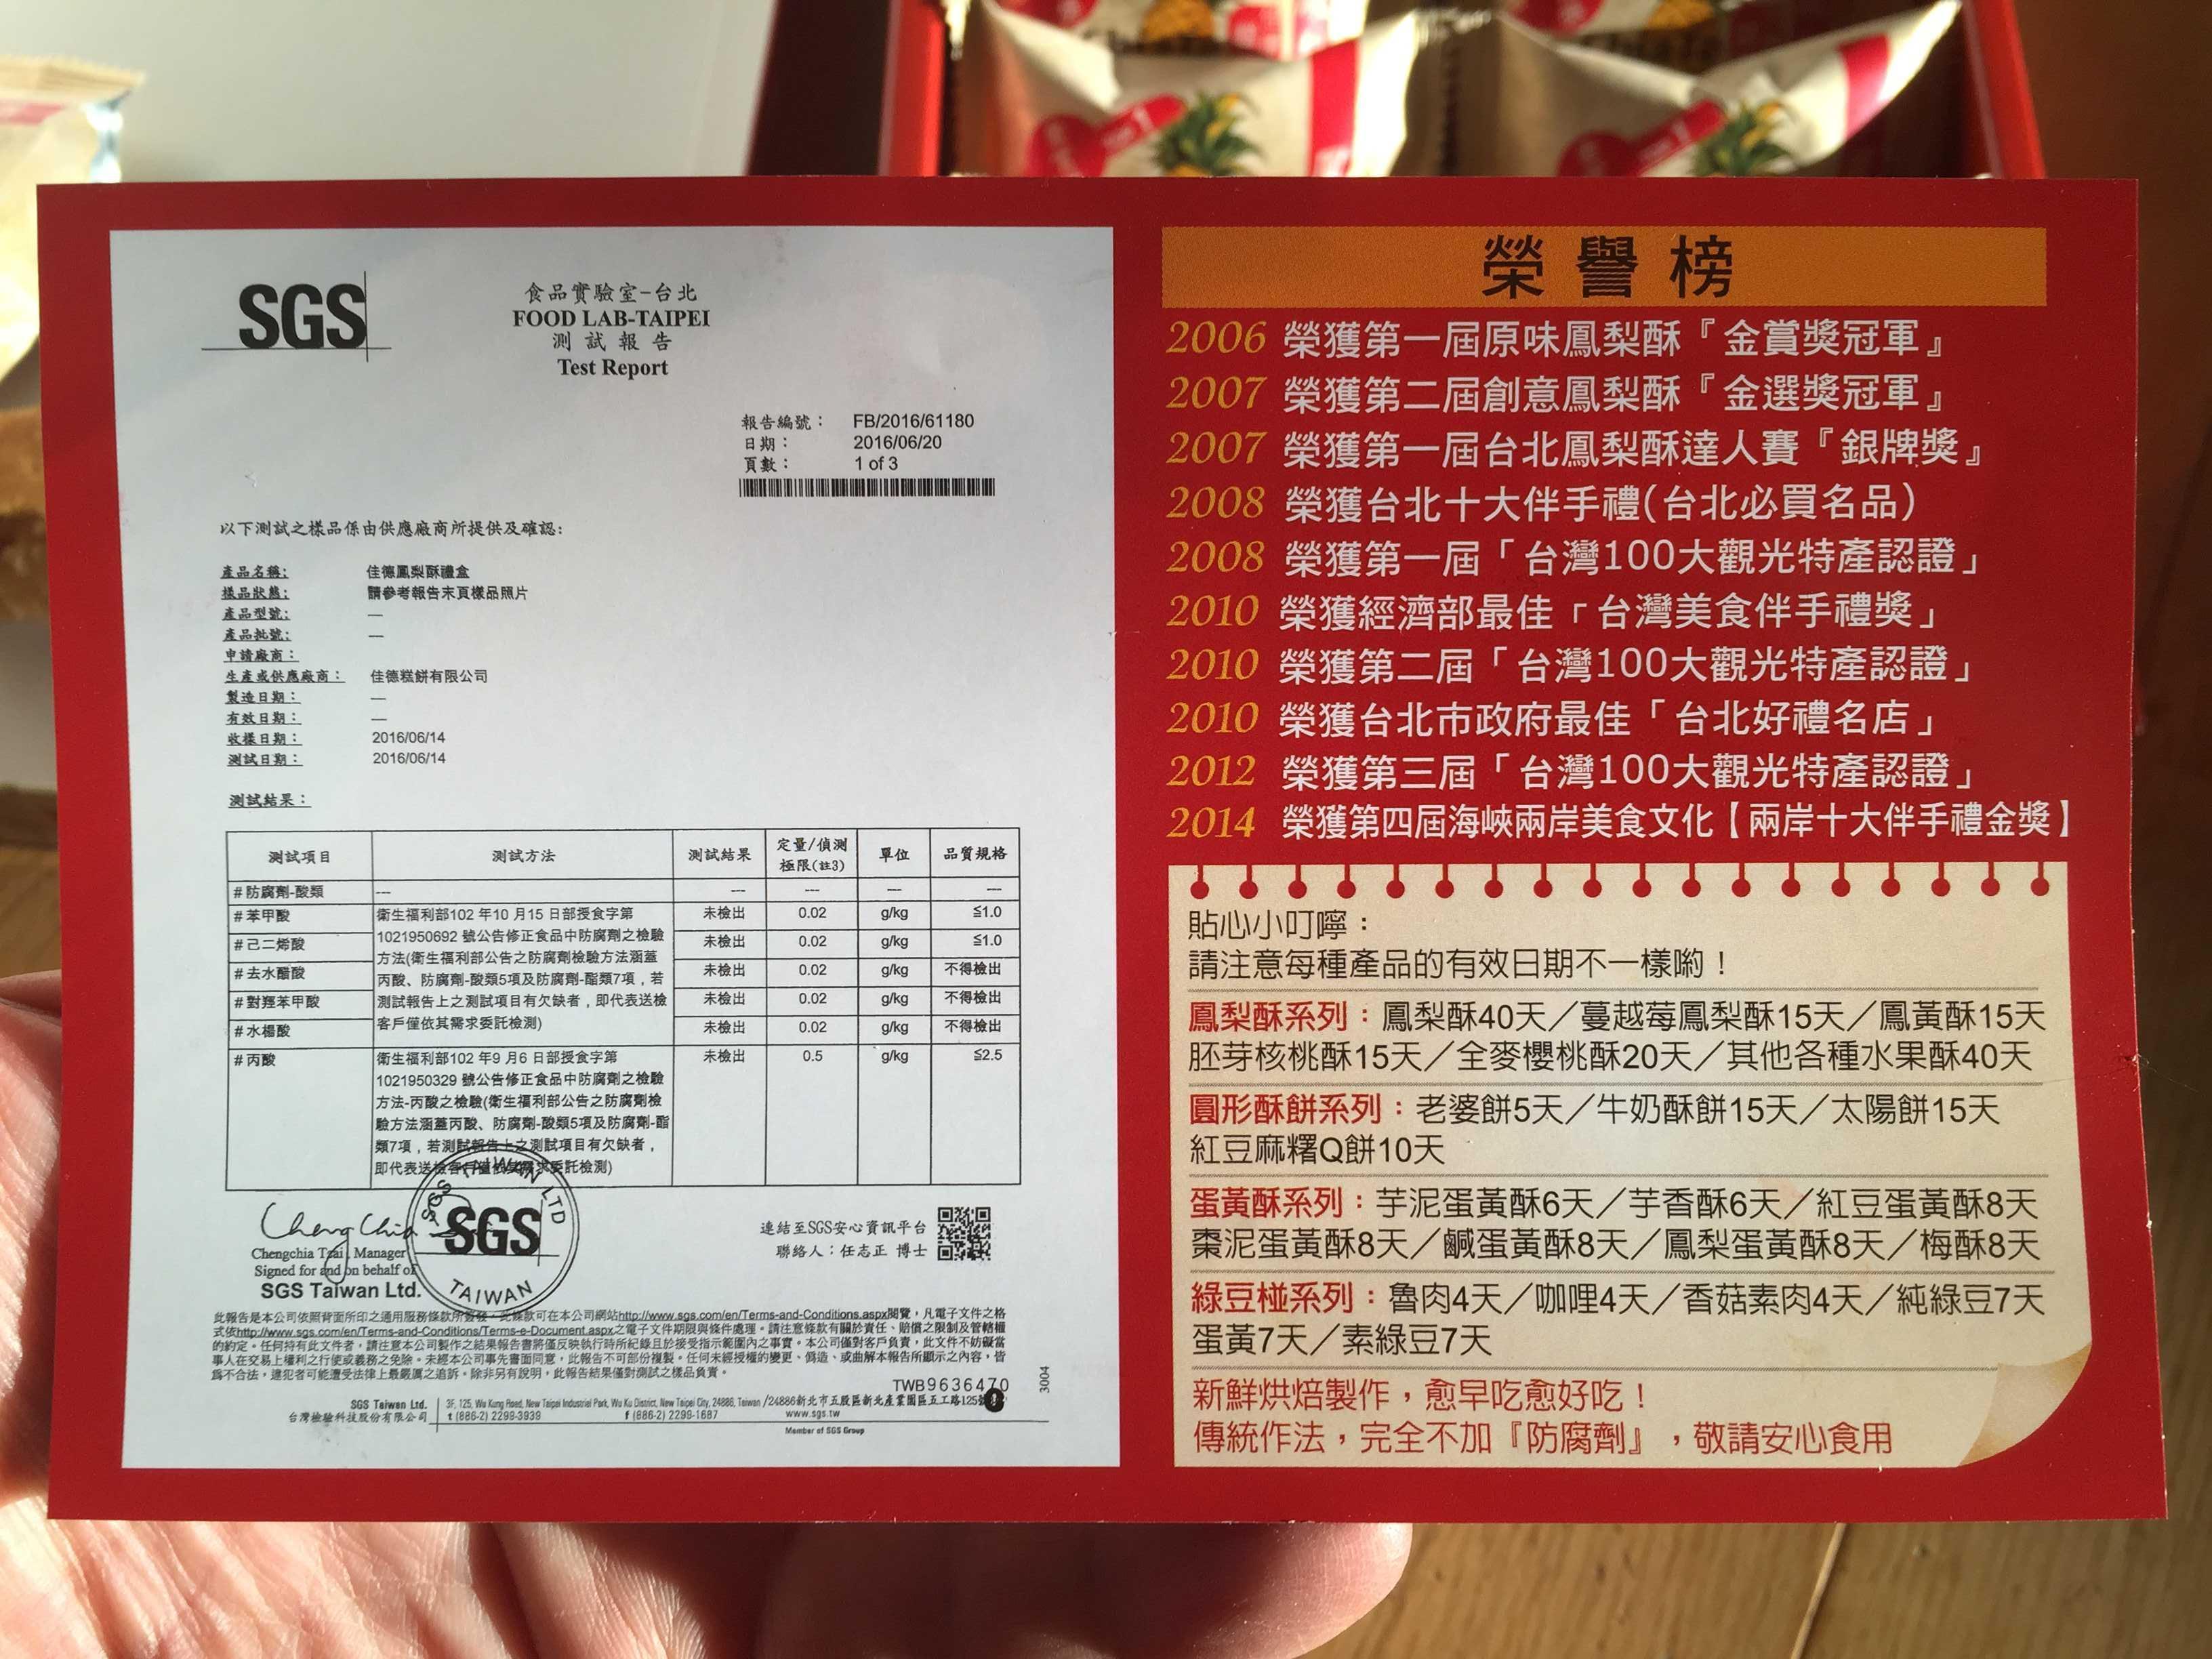 Chia Te(佳徳鳳梨酥/佳徳糕餅) のパイナップルケーキの受賞歴